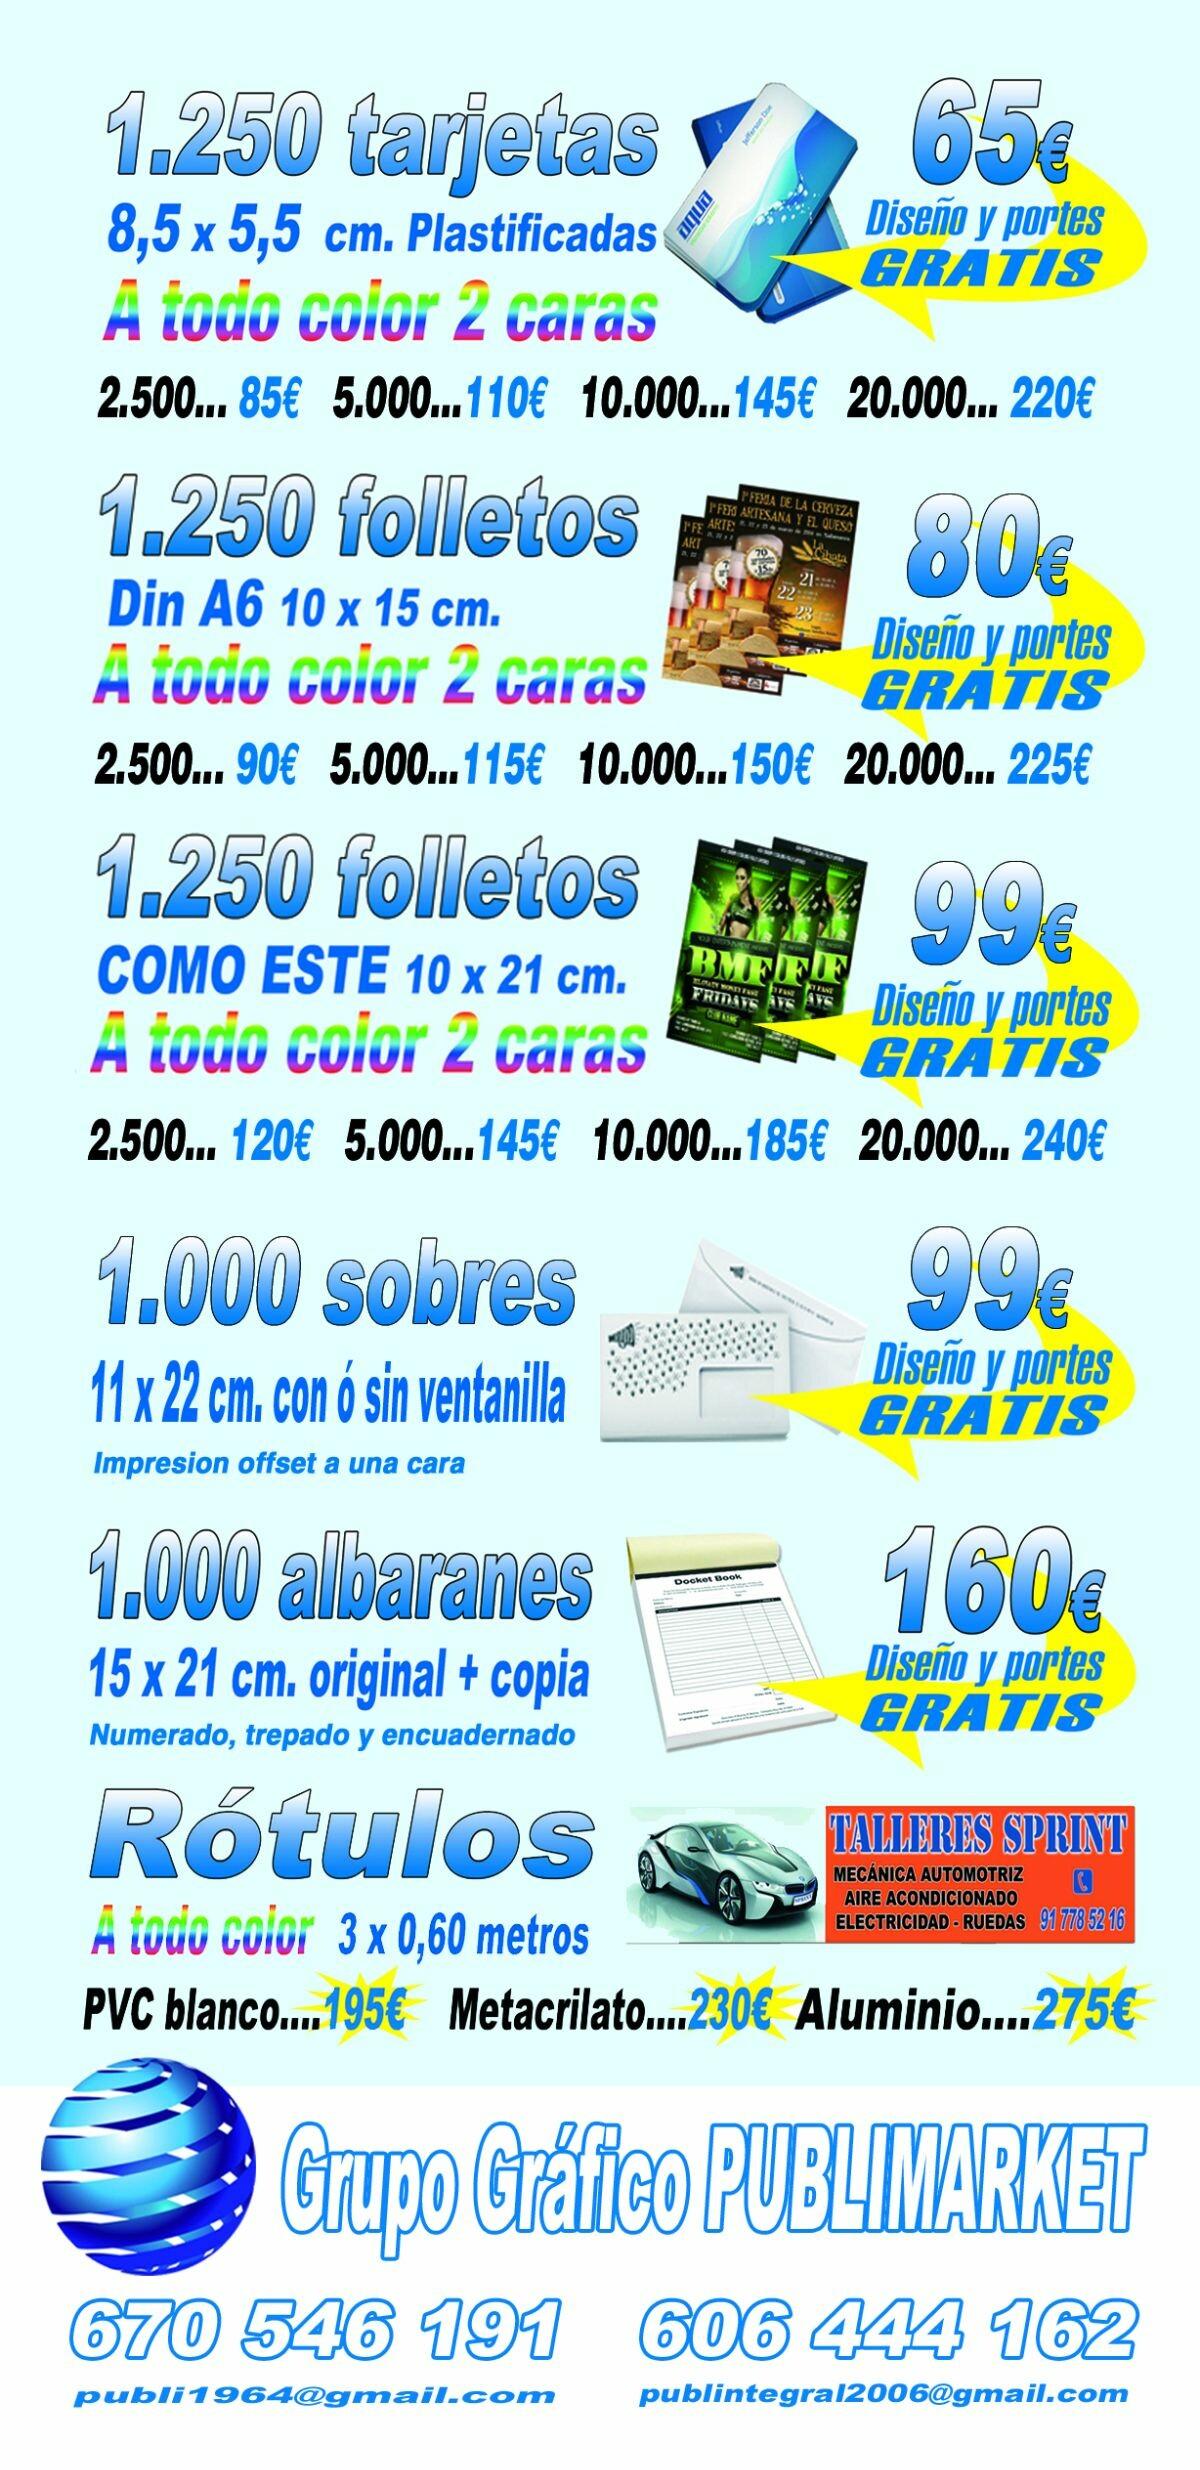 GRUPO GRAFICO PUBLIMARKET